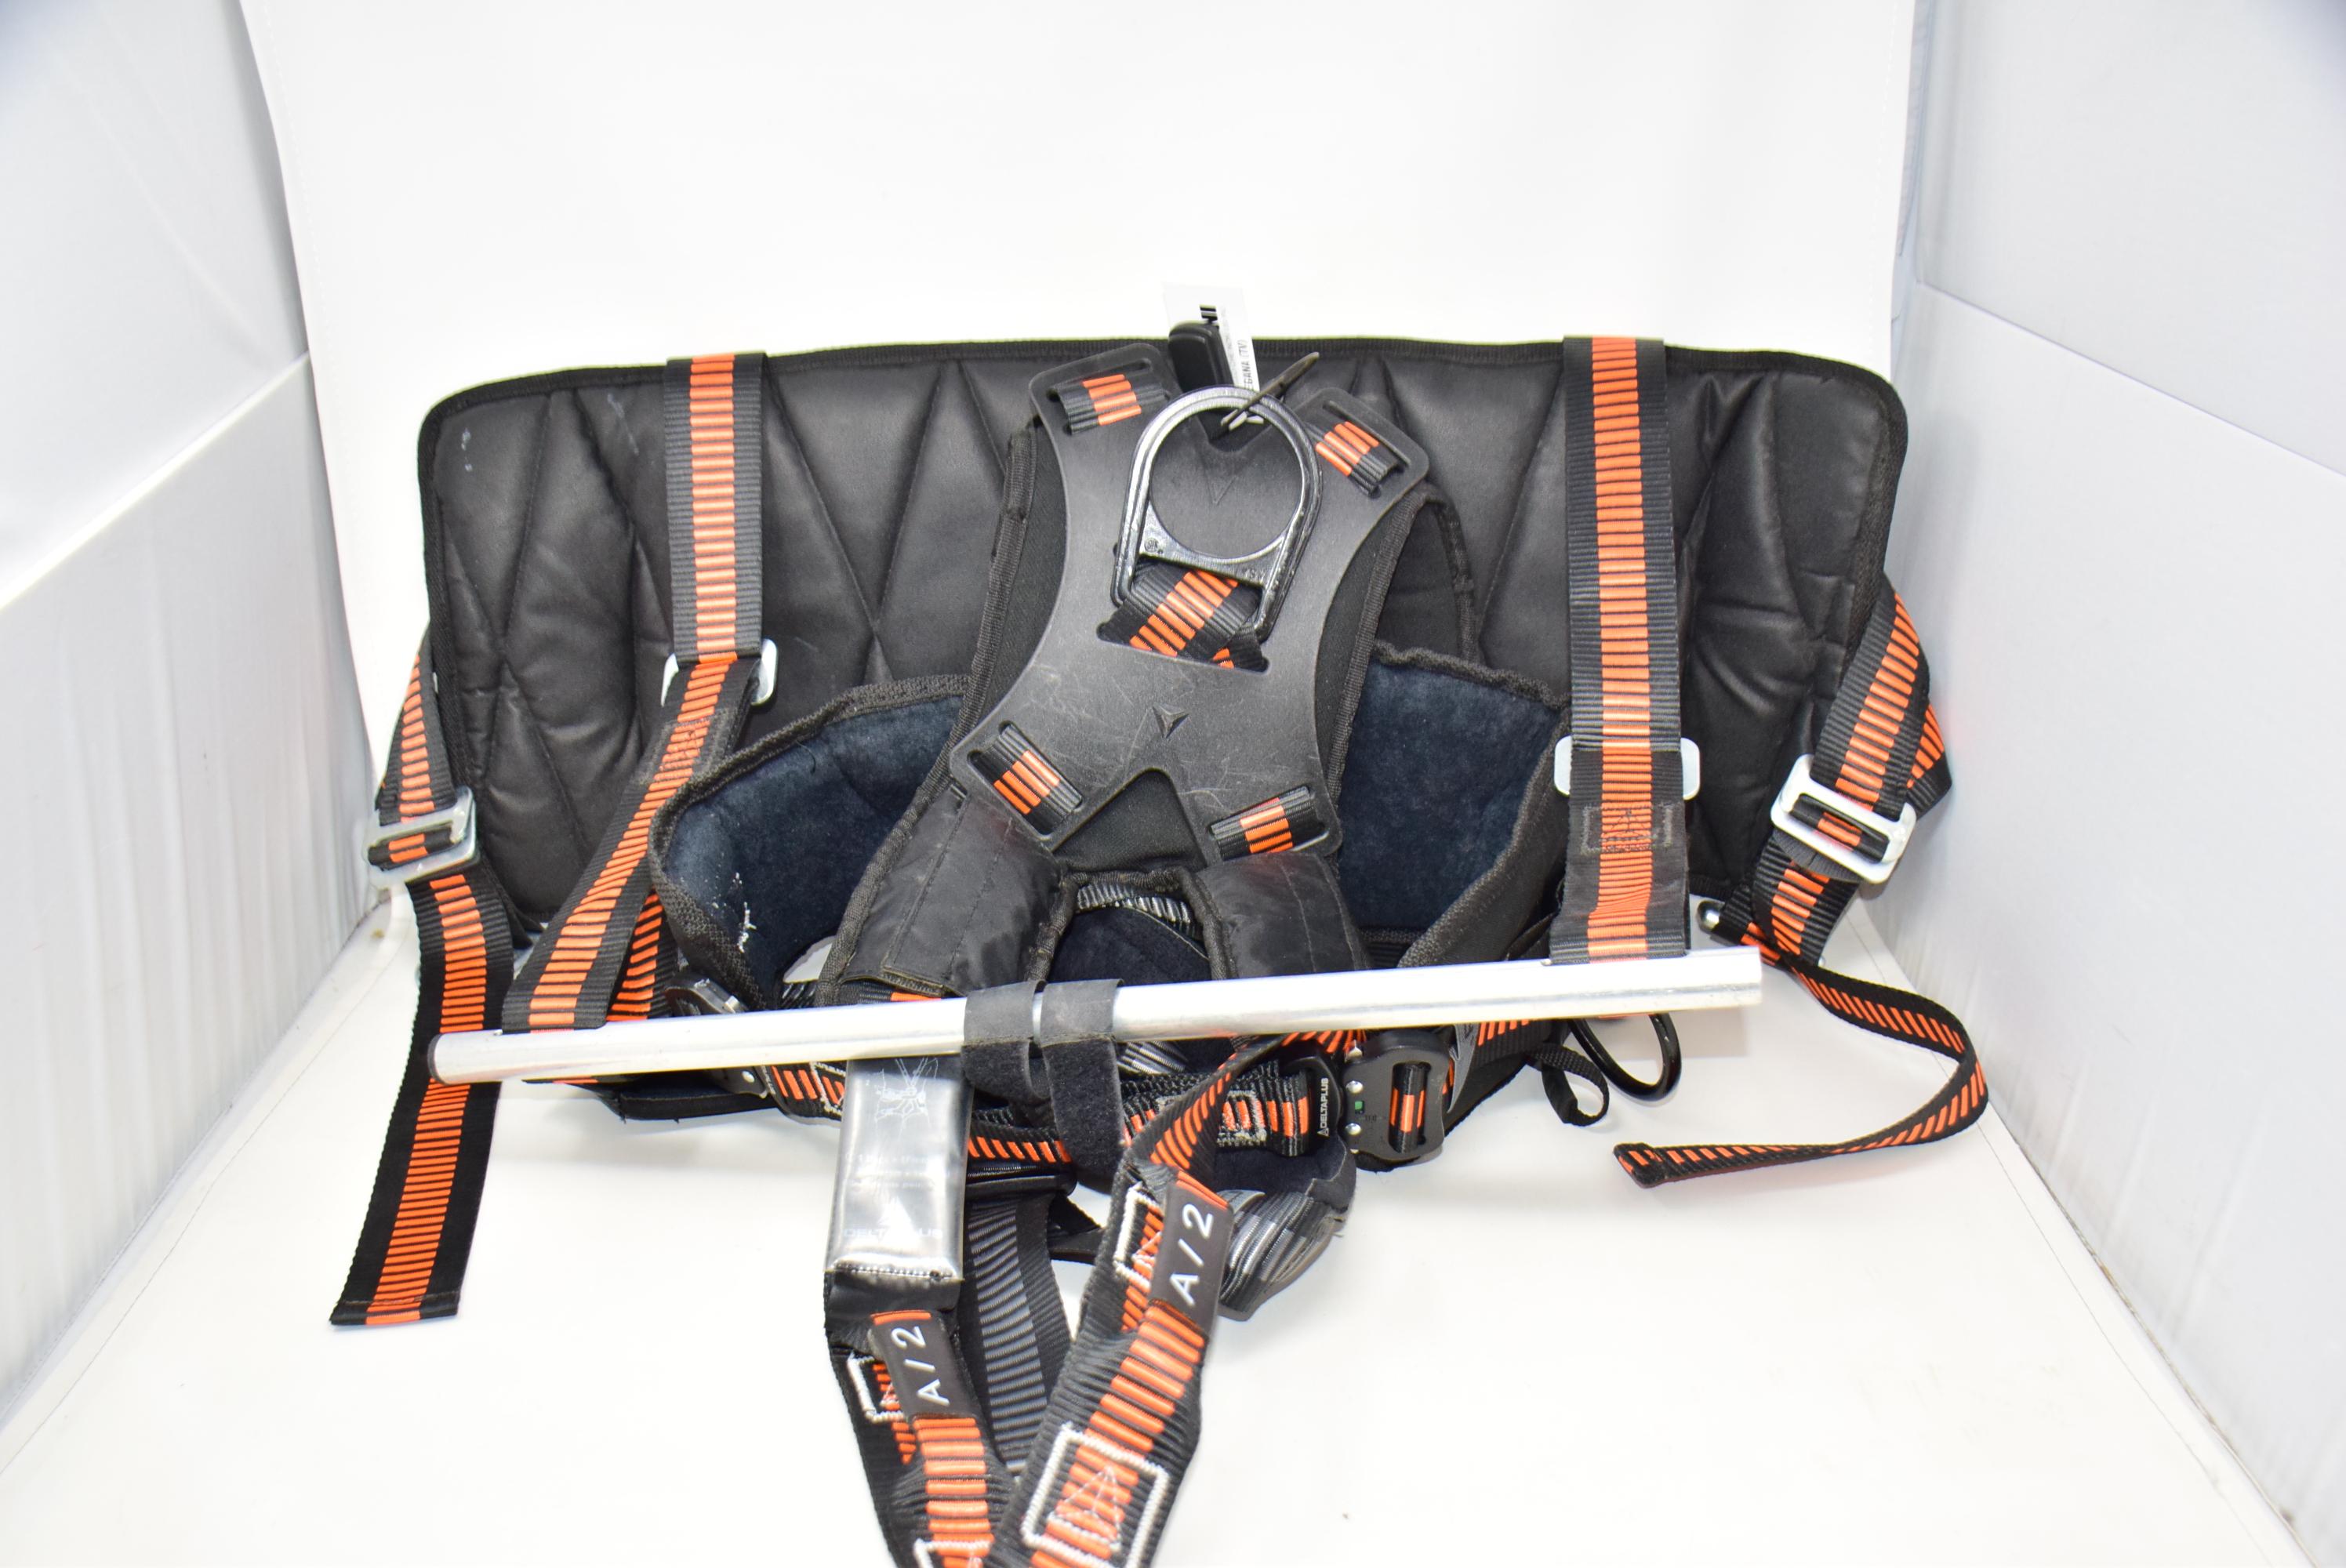 Imbragatura Per Lavori In Corda Deltaplus (max 150kg)